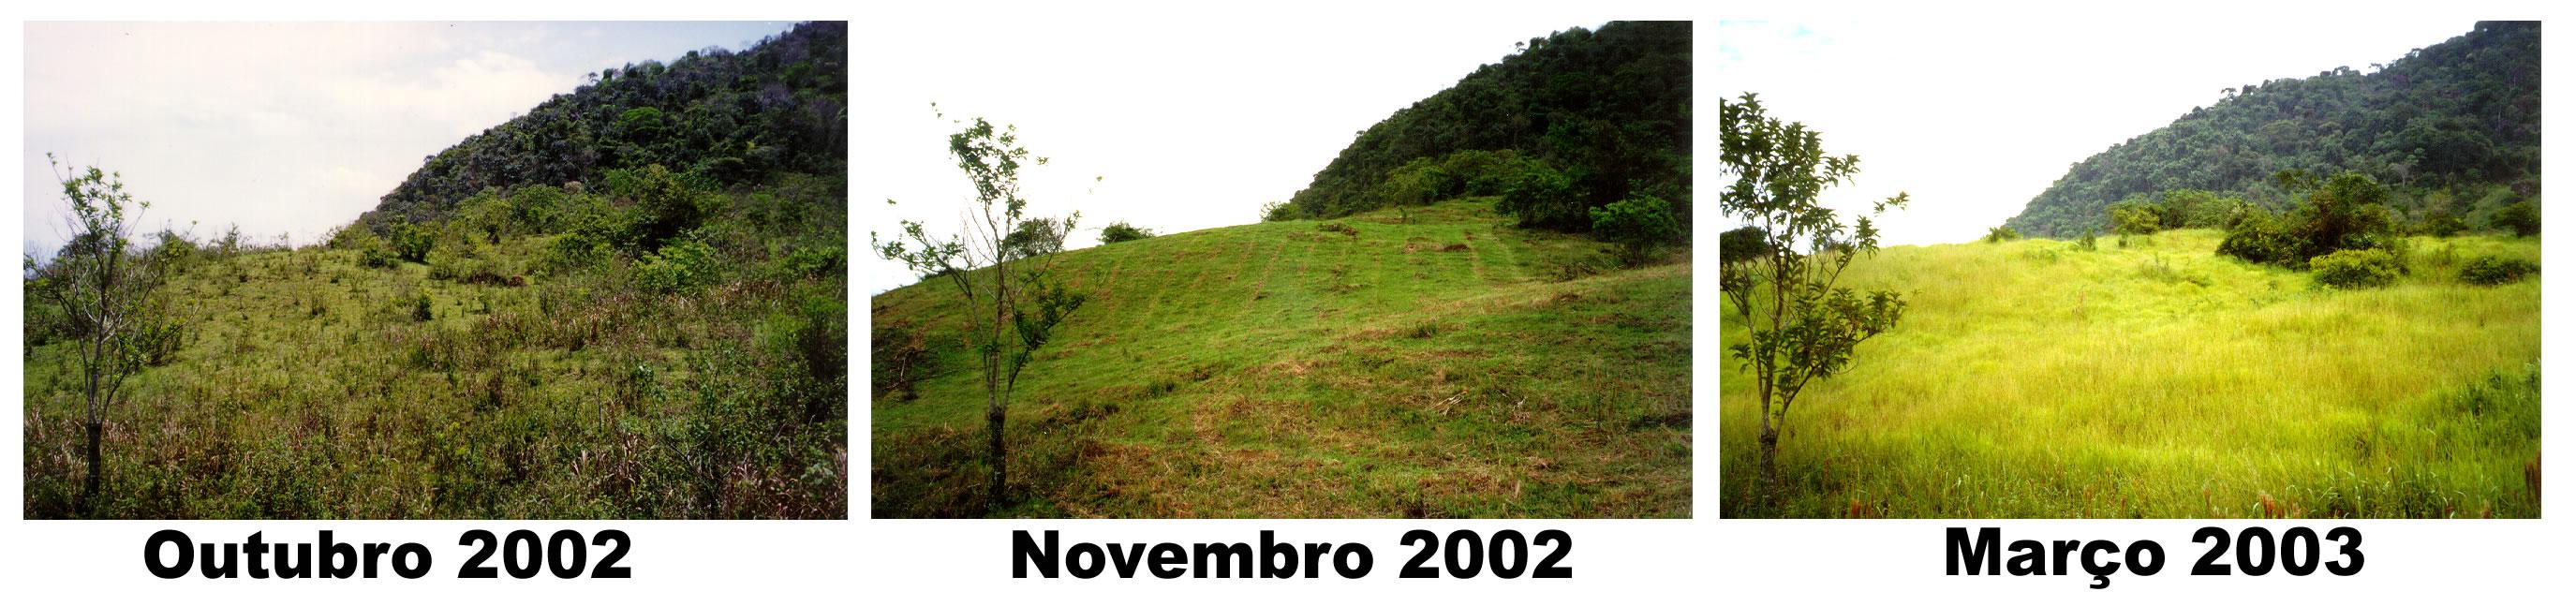 brazilalbertolandscape.jpg